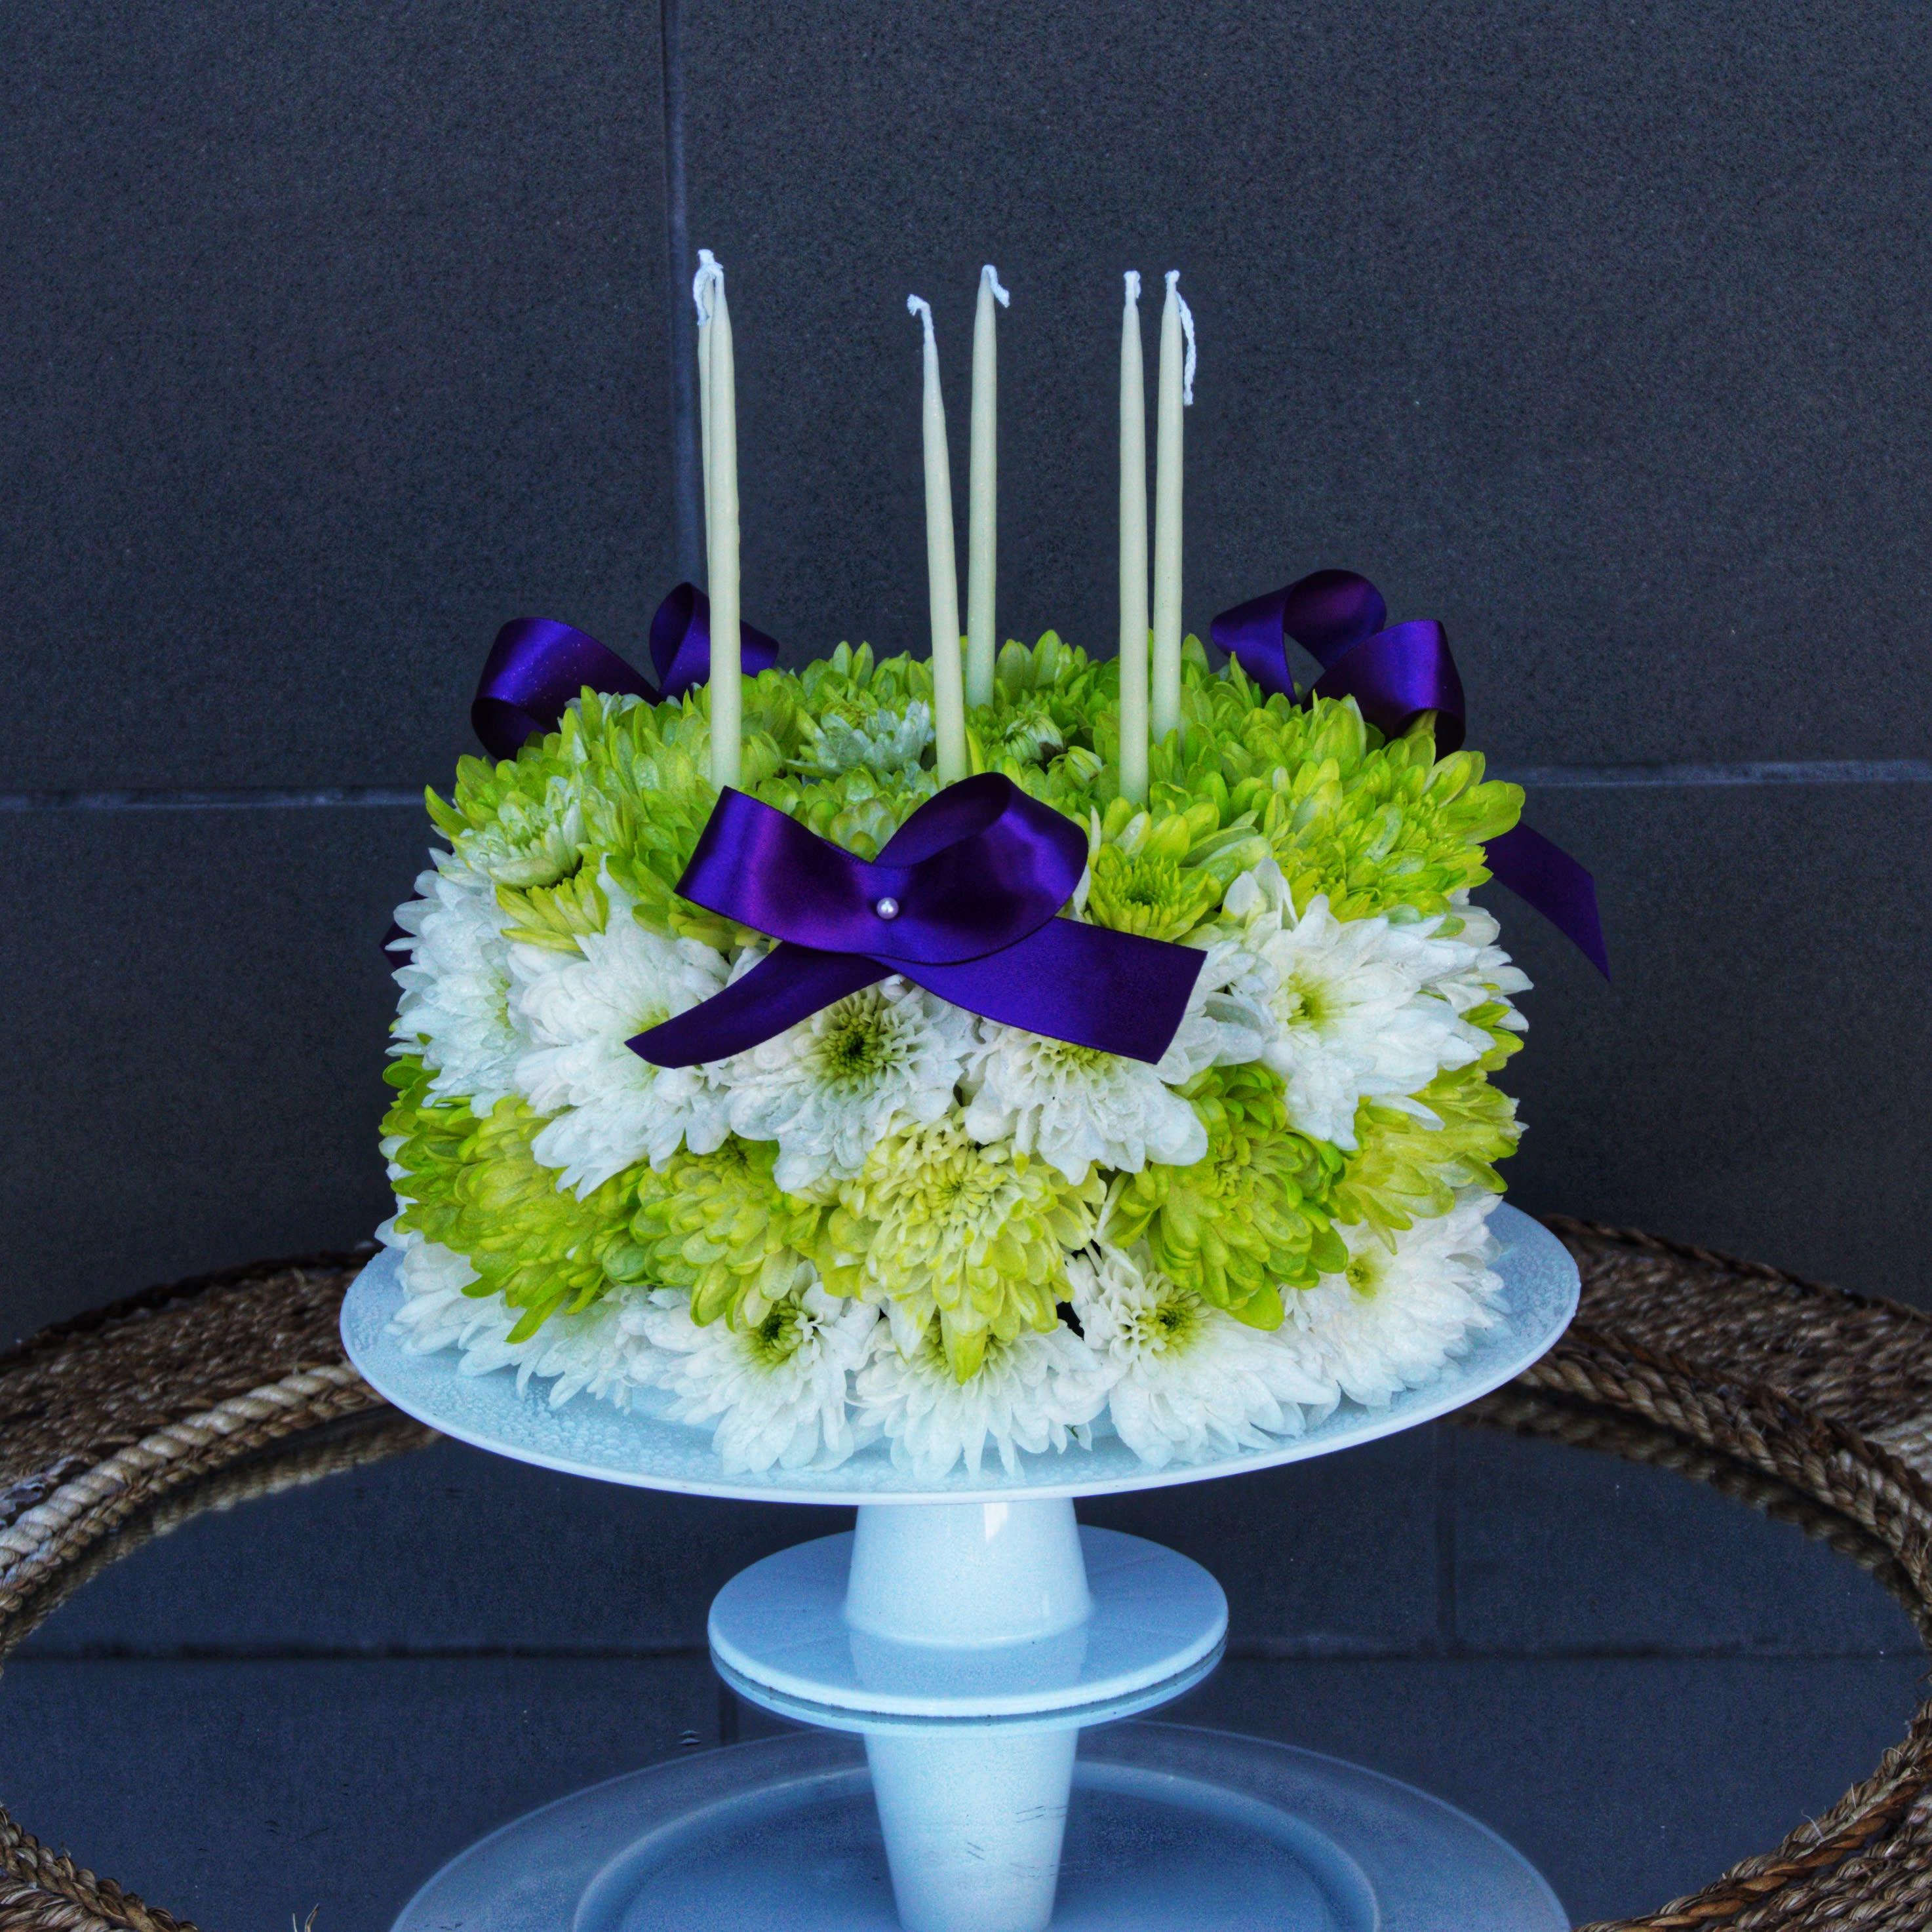 Birthday Wishes In Huntington Beach CA